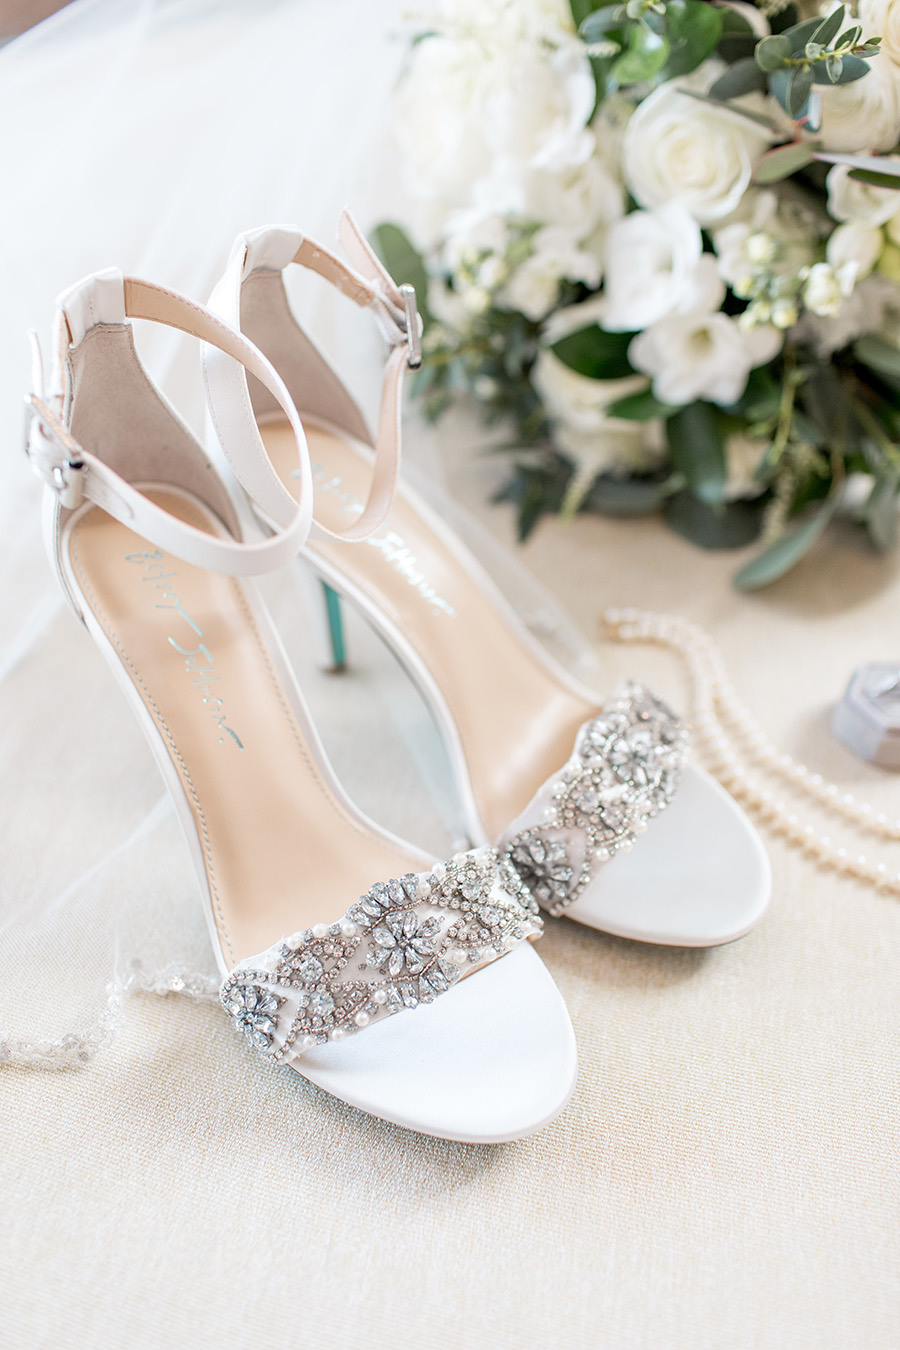 rhinestone wedding heels by Betsy Johnson